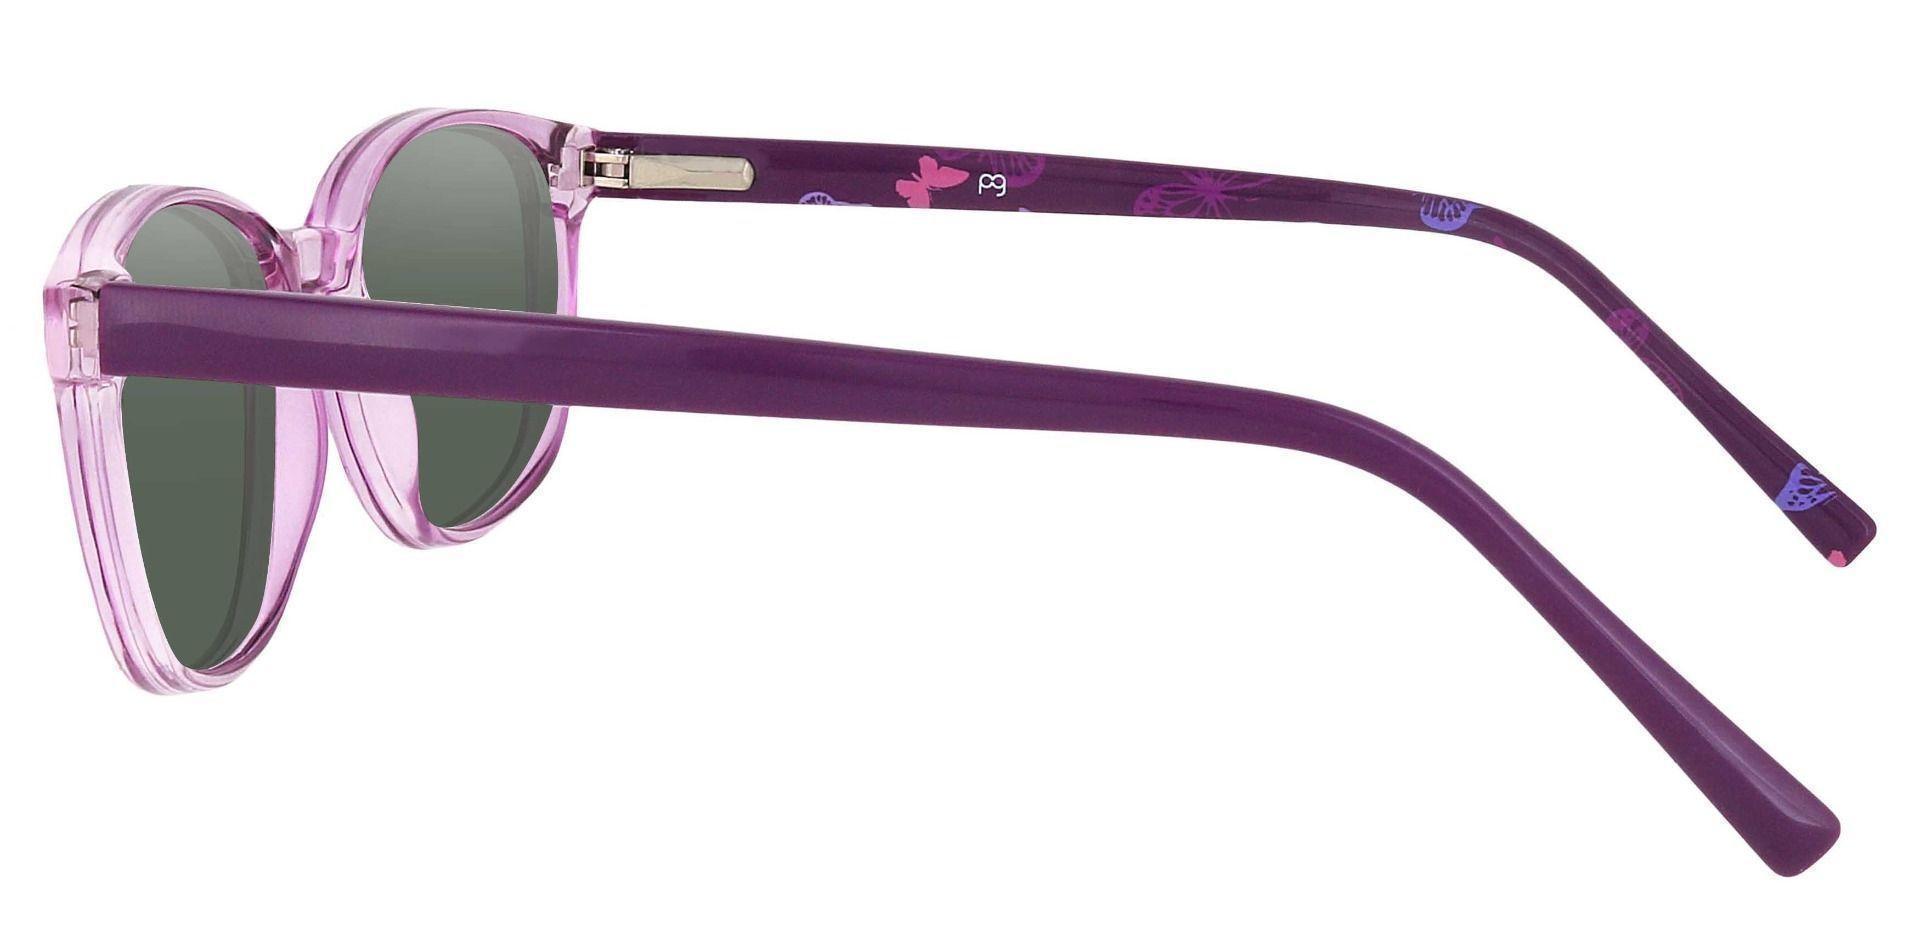 Branson Rectangle Prescription Sunglasses - Purple Frame With Green Lenses